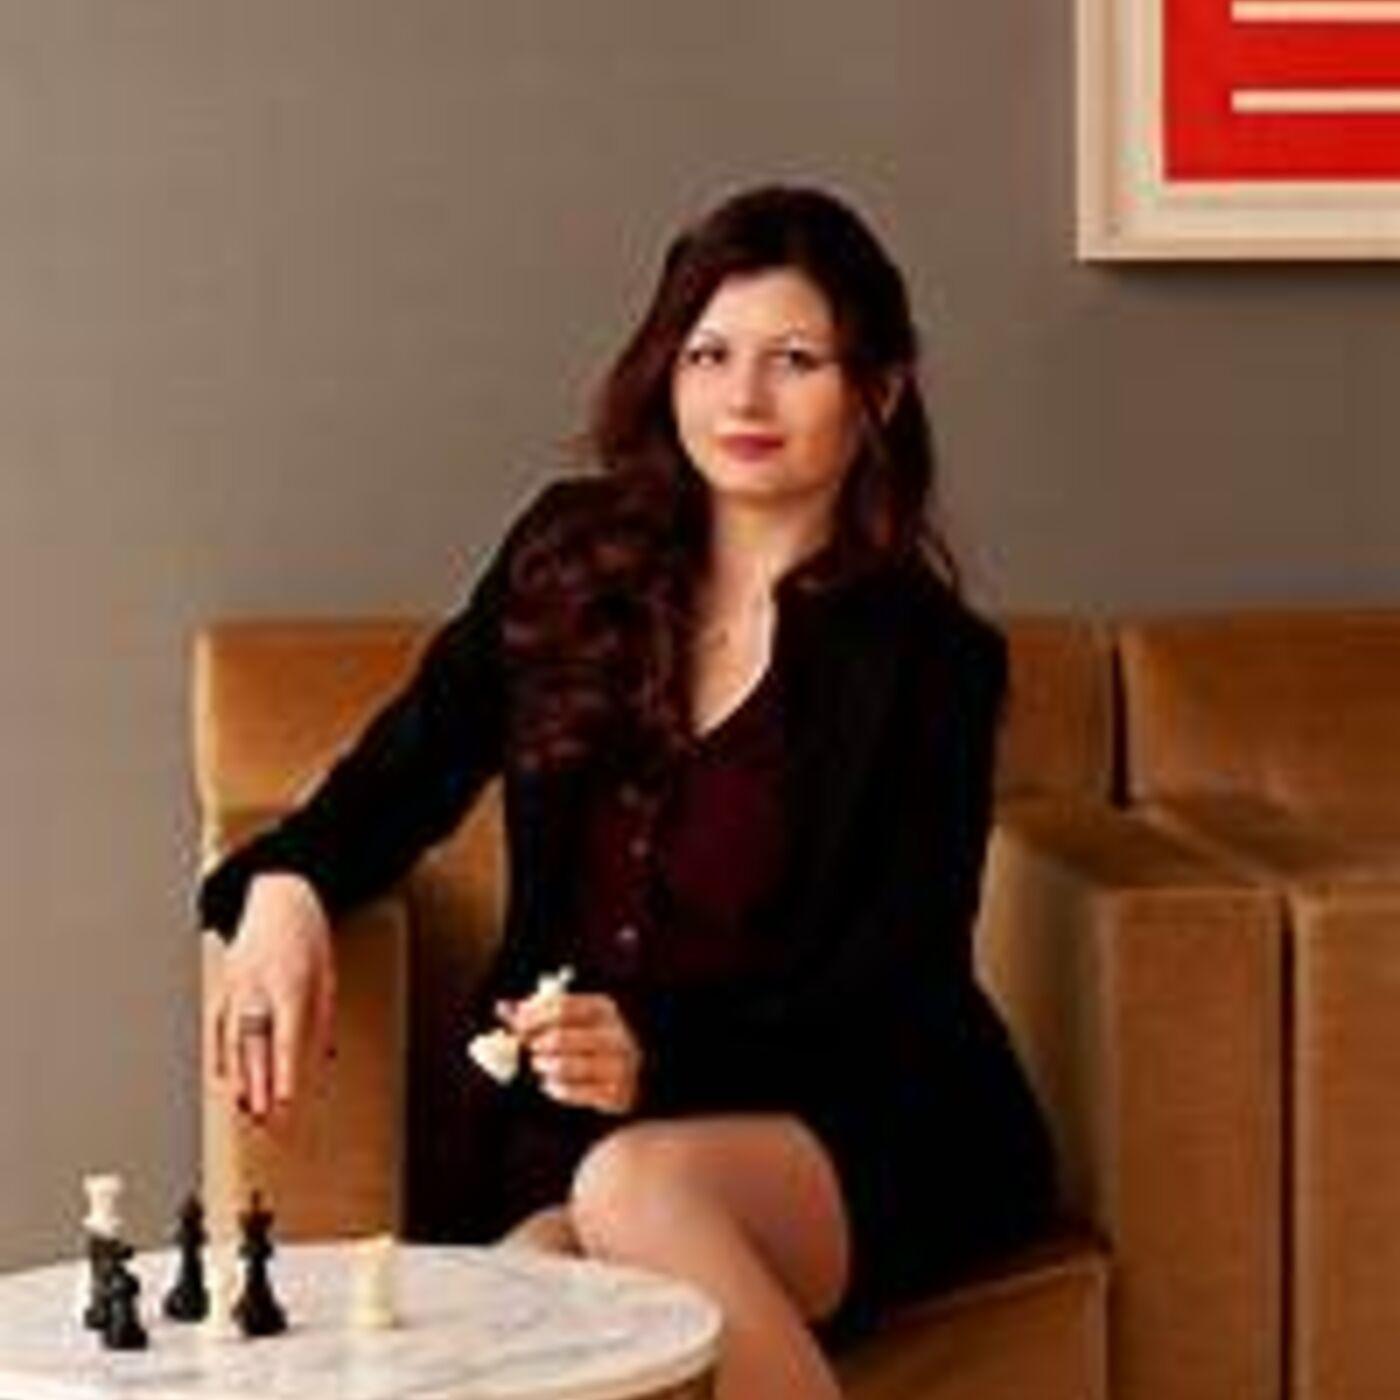 140th Episode with Fide Master Alisa Melekhina, Litigation Associate at Debevoise & Plimpton